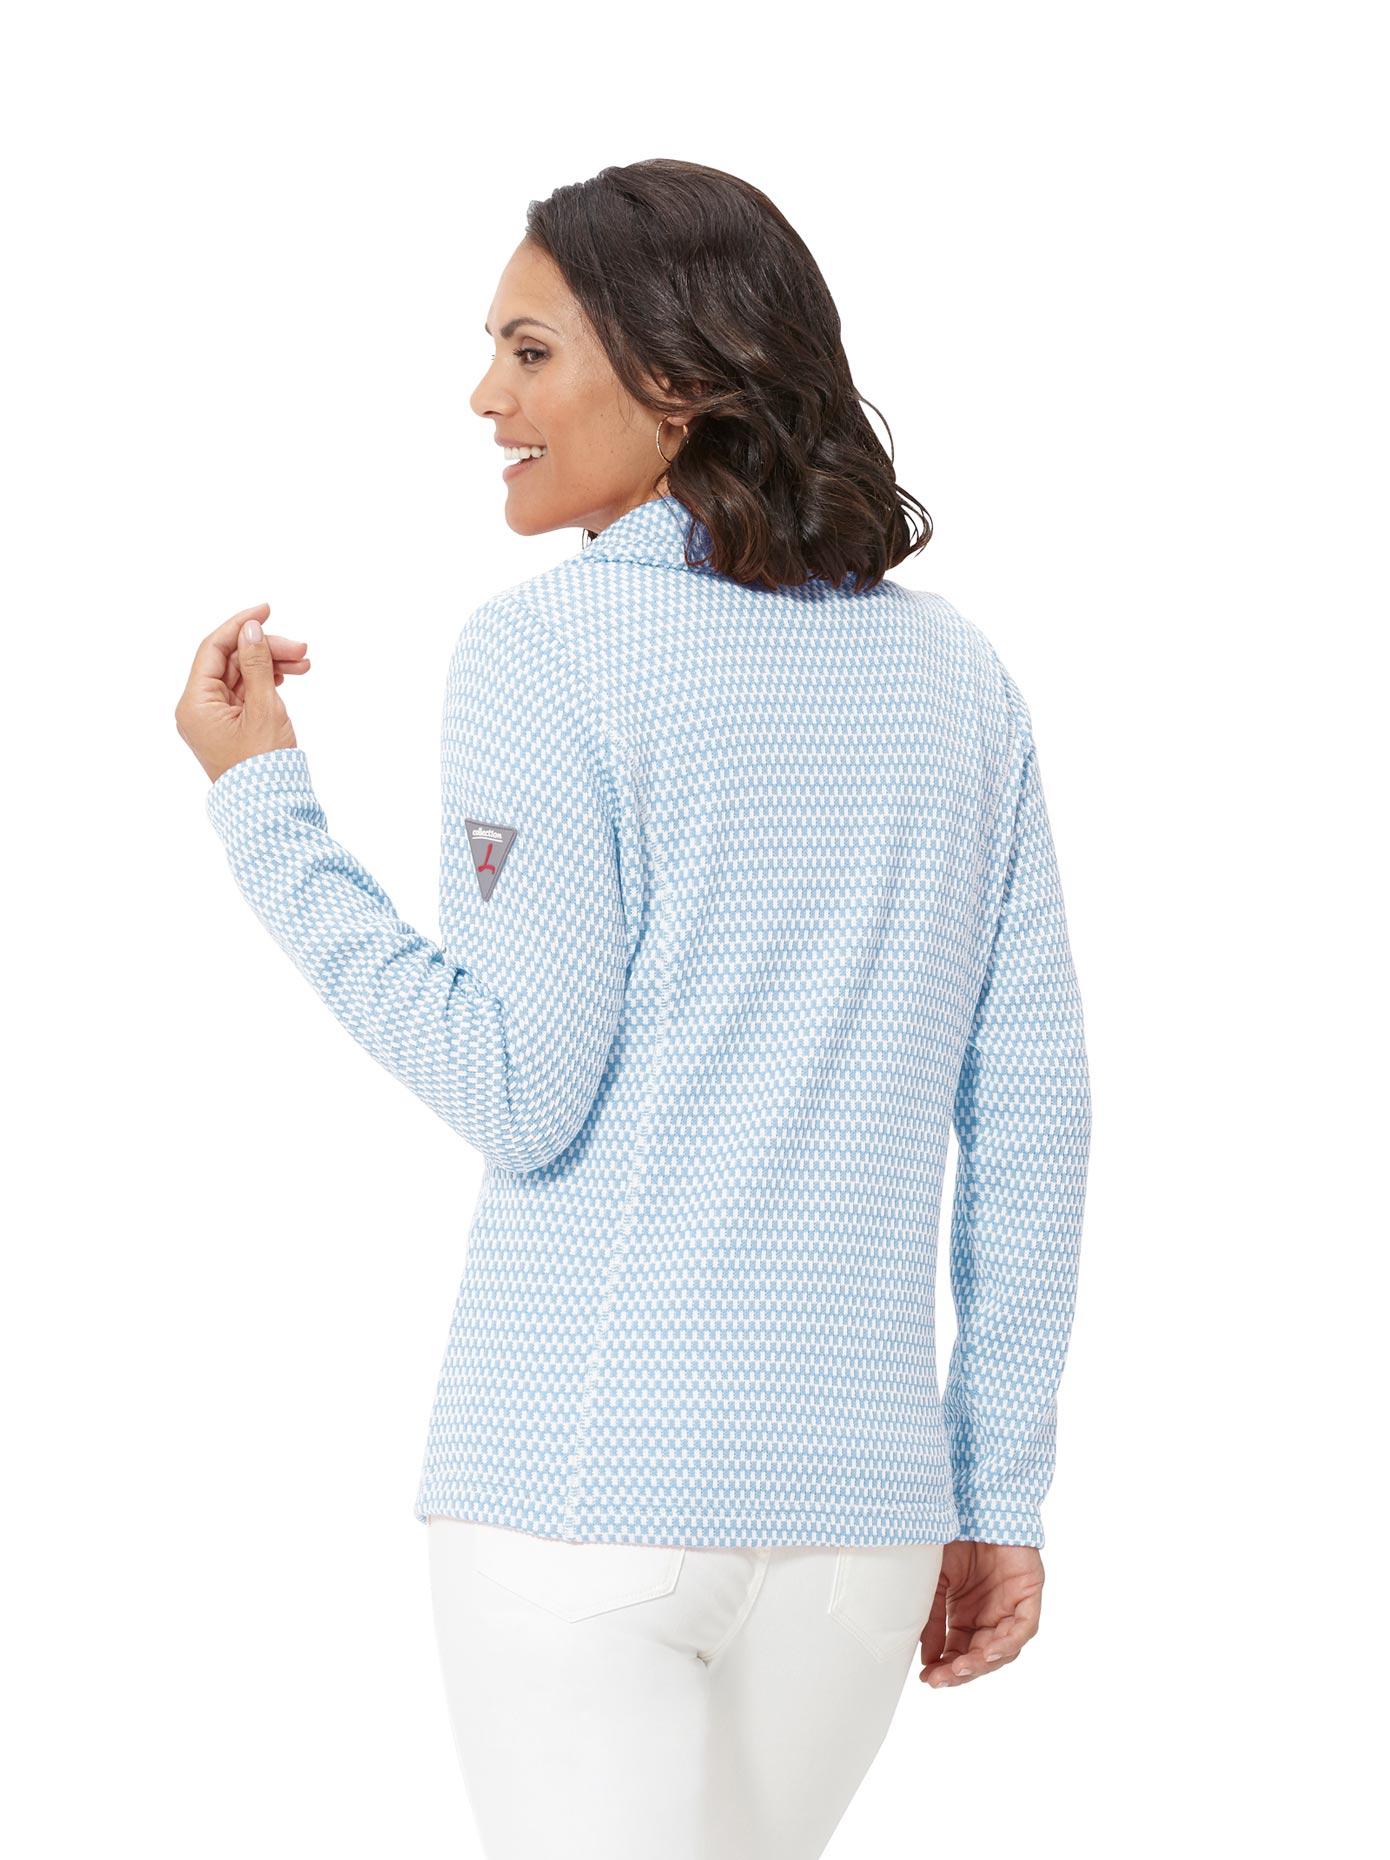 Casual Looks Fleece-Jacke im Zick-Zack-Muster | Bekleidung > Jacken > Fleecejacken | Blau | Fleece | Casual Looks